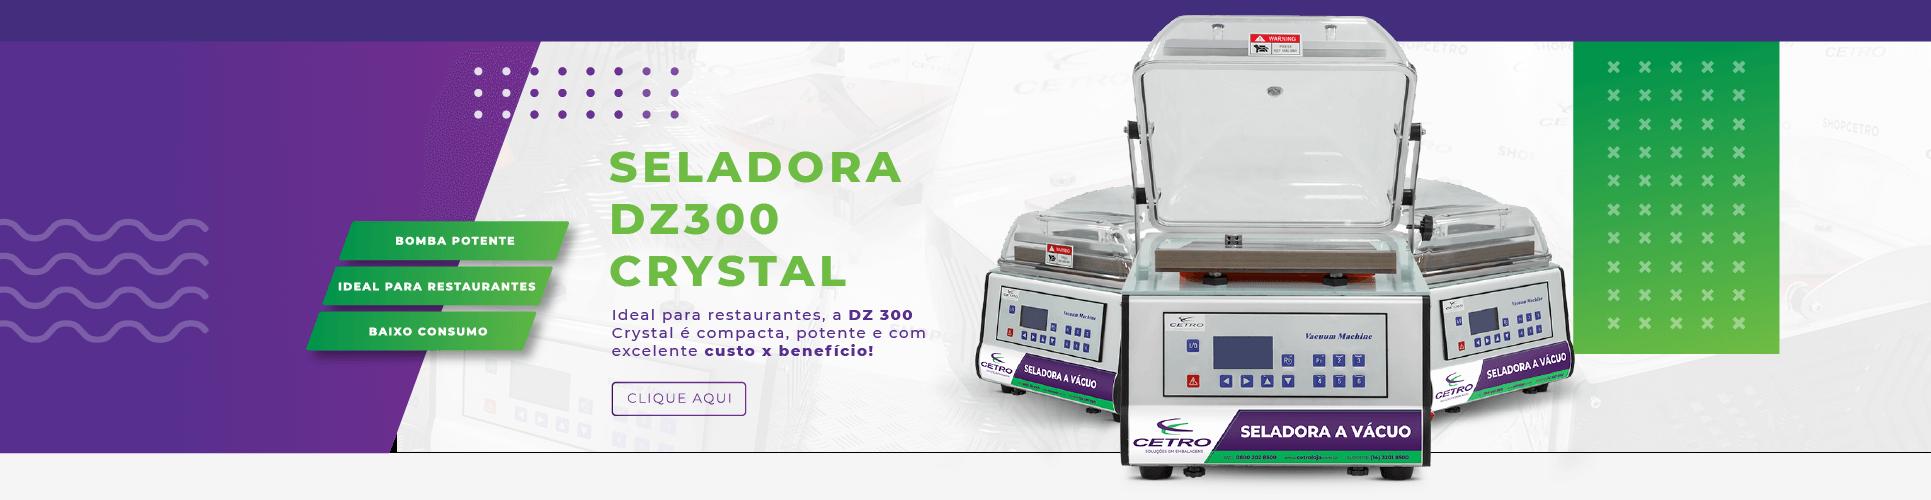 seladoradz300_2020